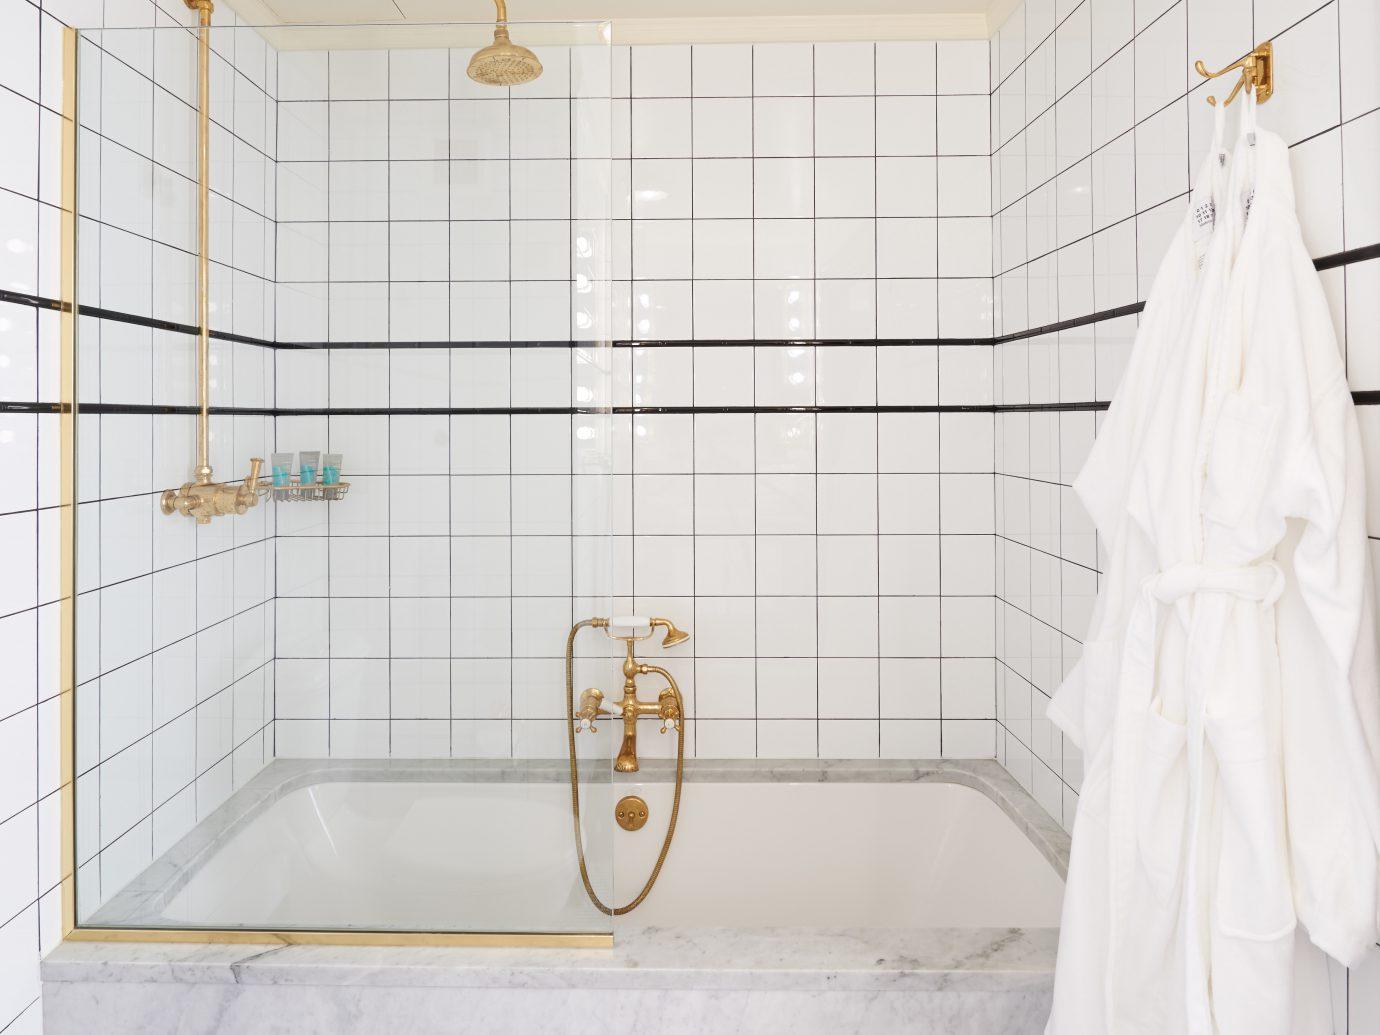 Bath Boutique City Modern Style + Design indoor room bathroom floor flooring bathtub plumbing fixture tile interior design furniture tiled